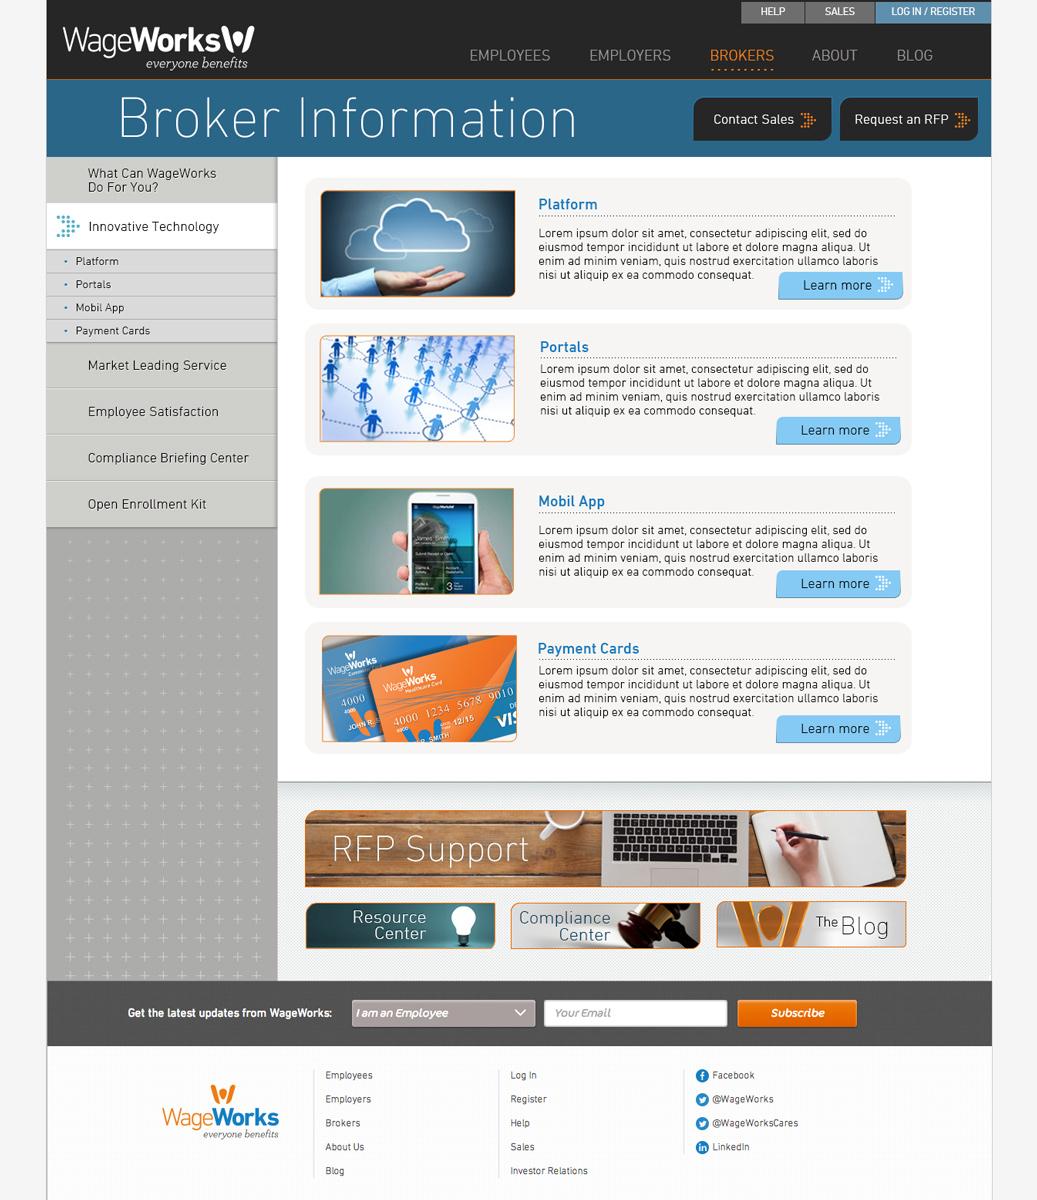 WageWorks Broker Information Landing Page